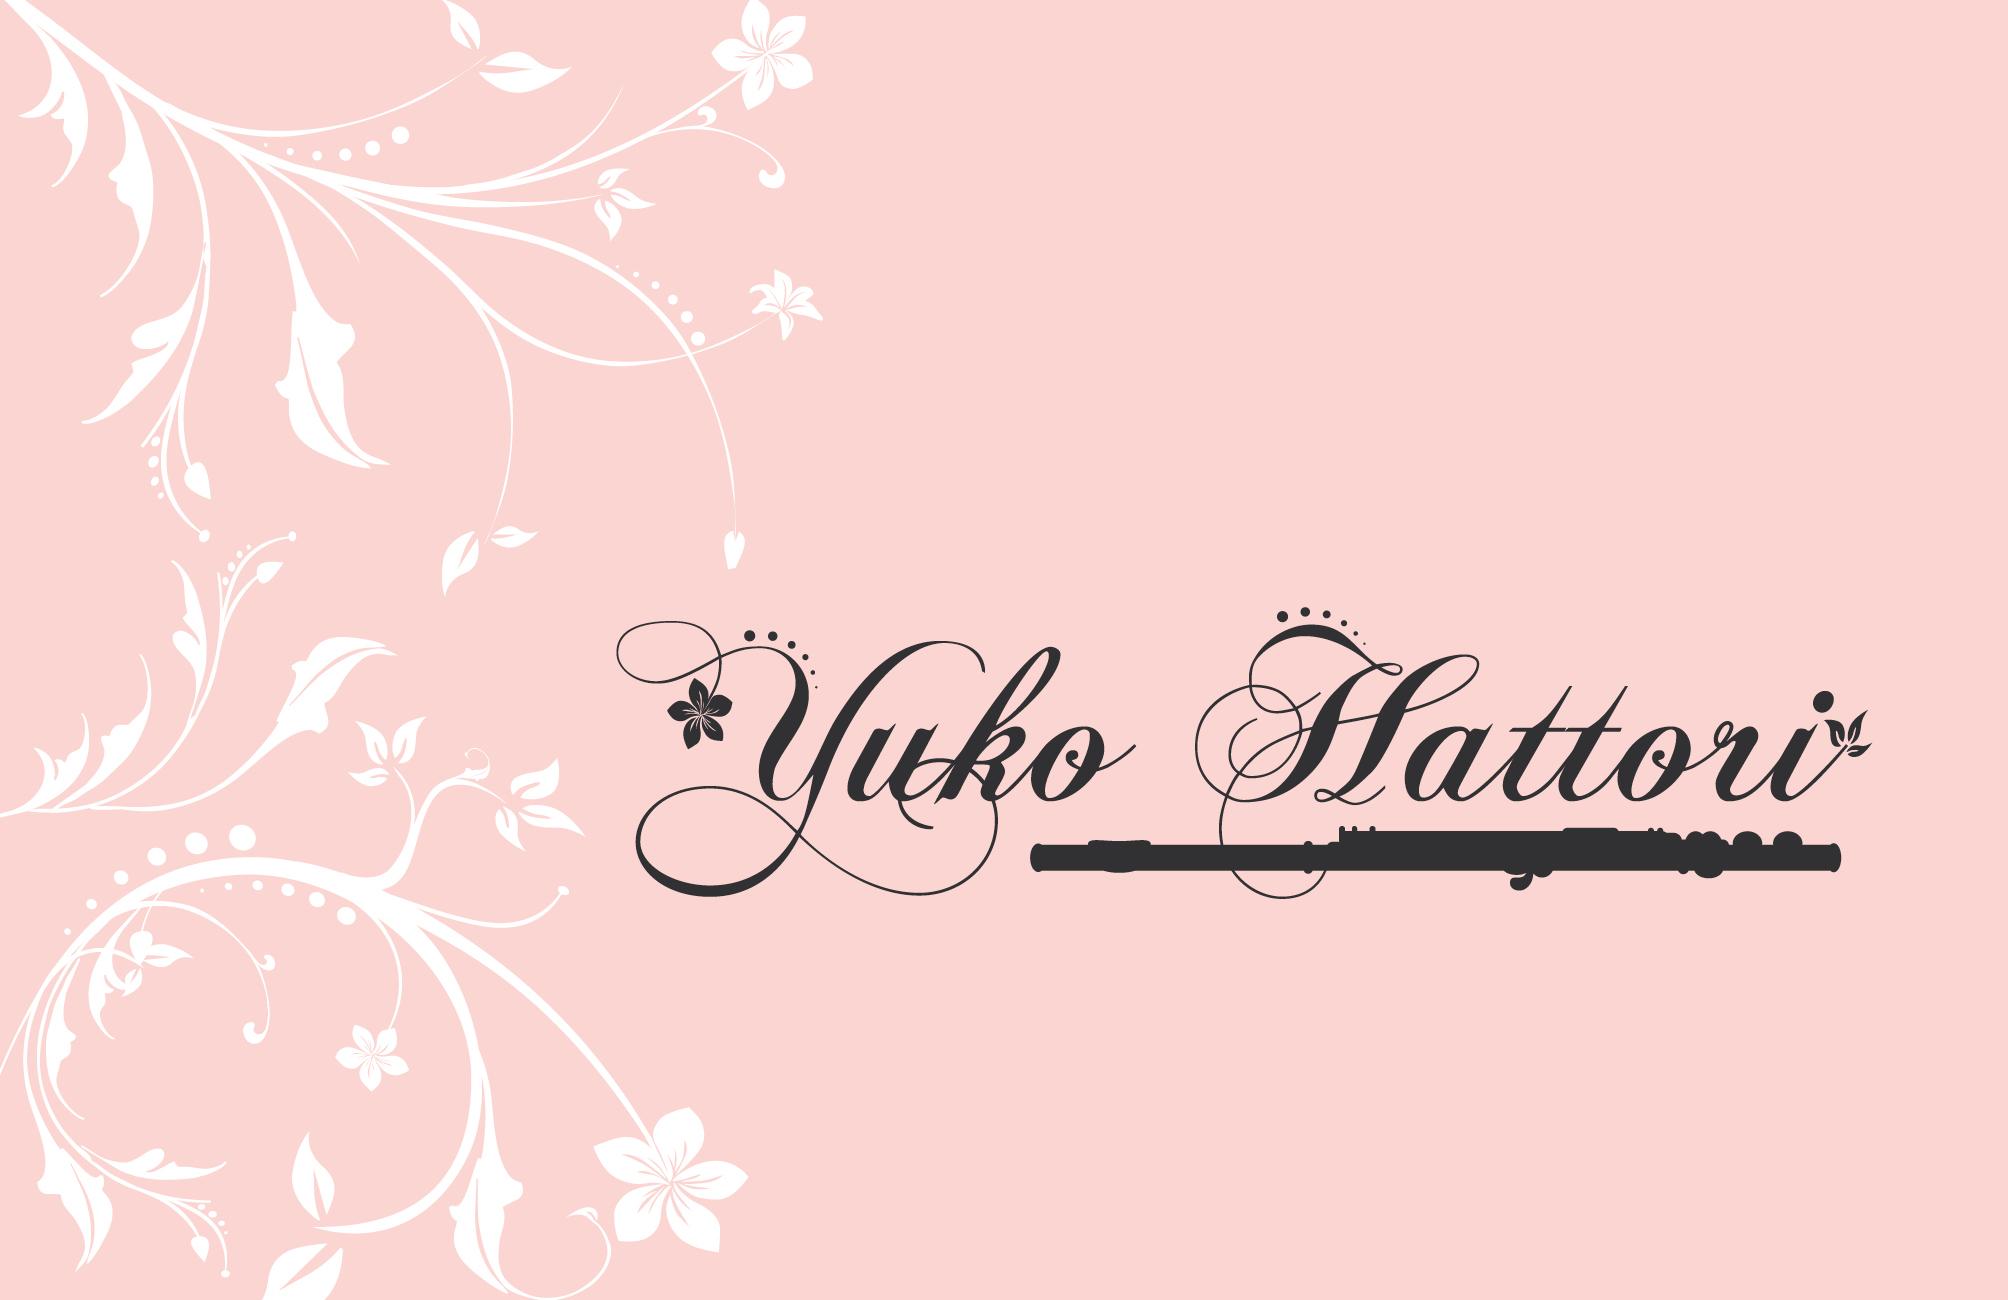 Yuko Hattori Flutist -Yuko Hattori